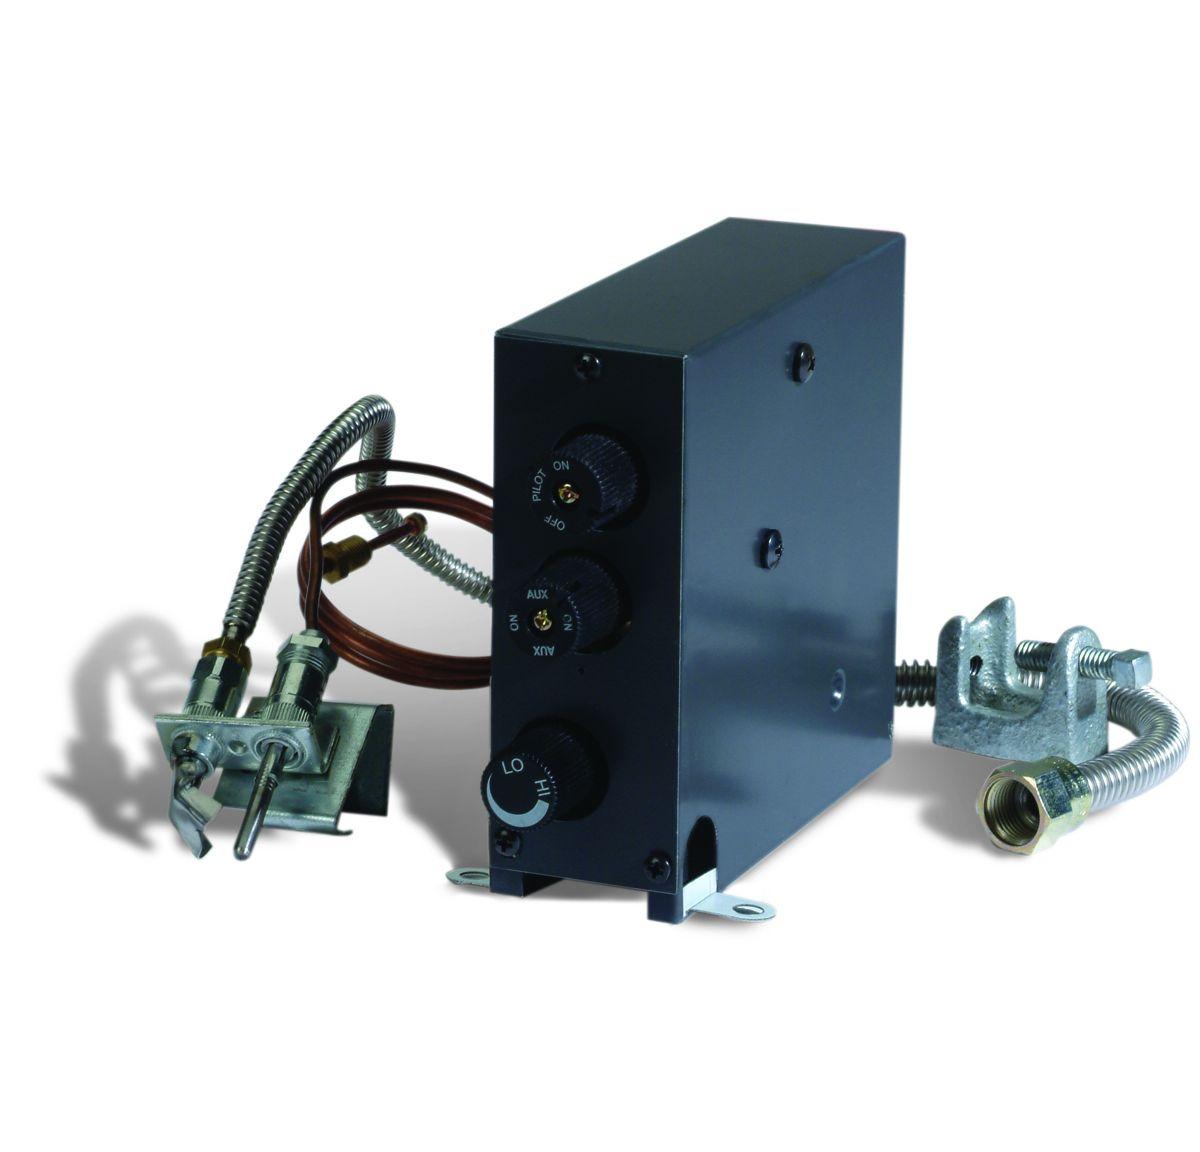 Skytech Remote Controls Gas Fireplace Thermostat